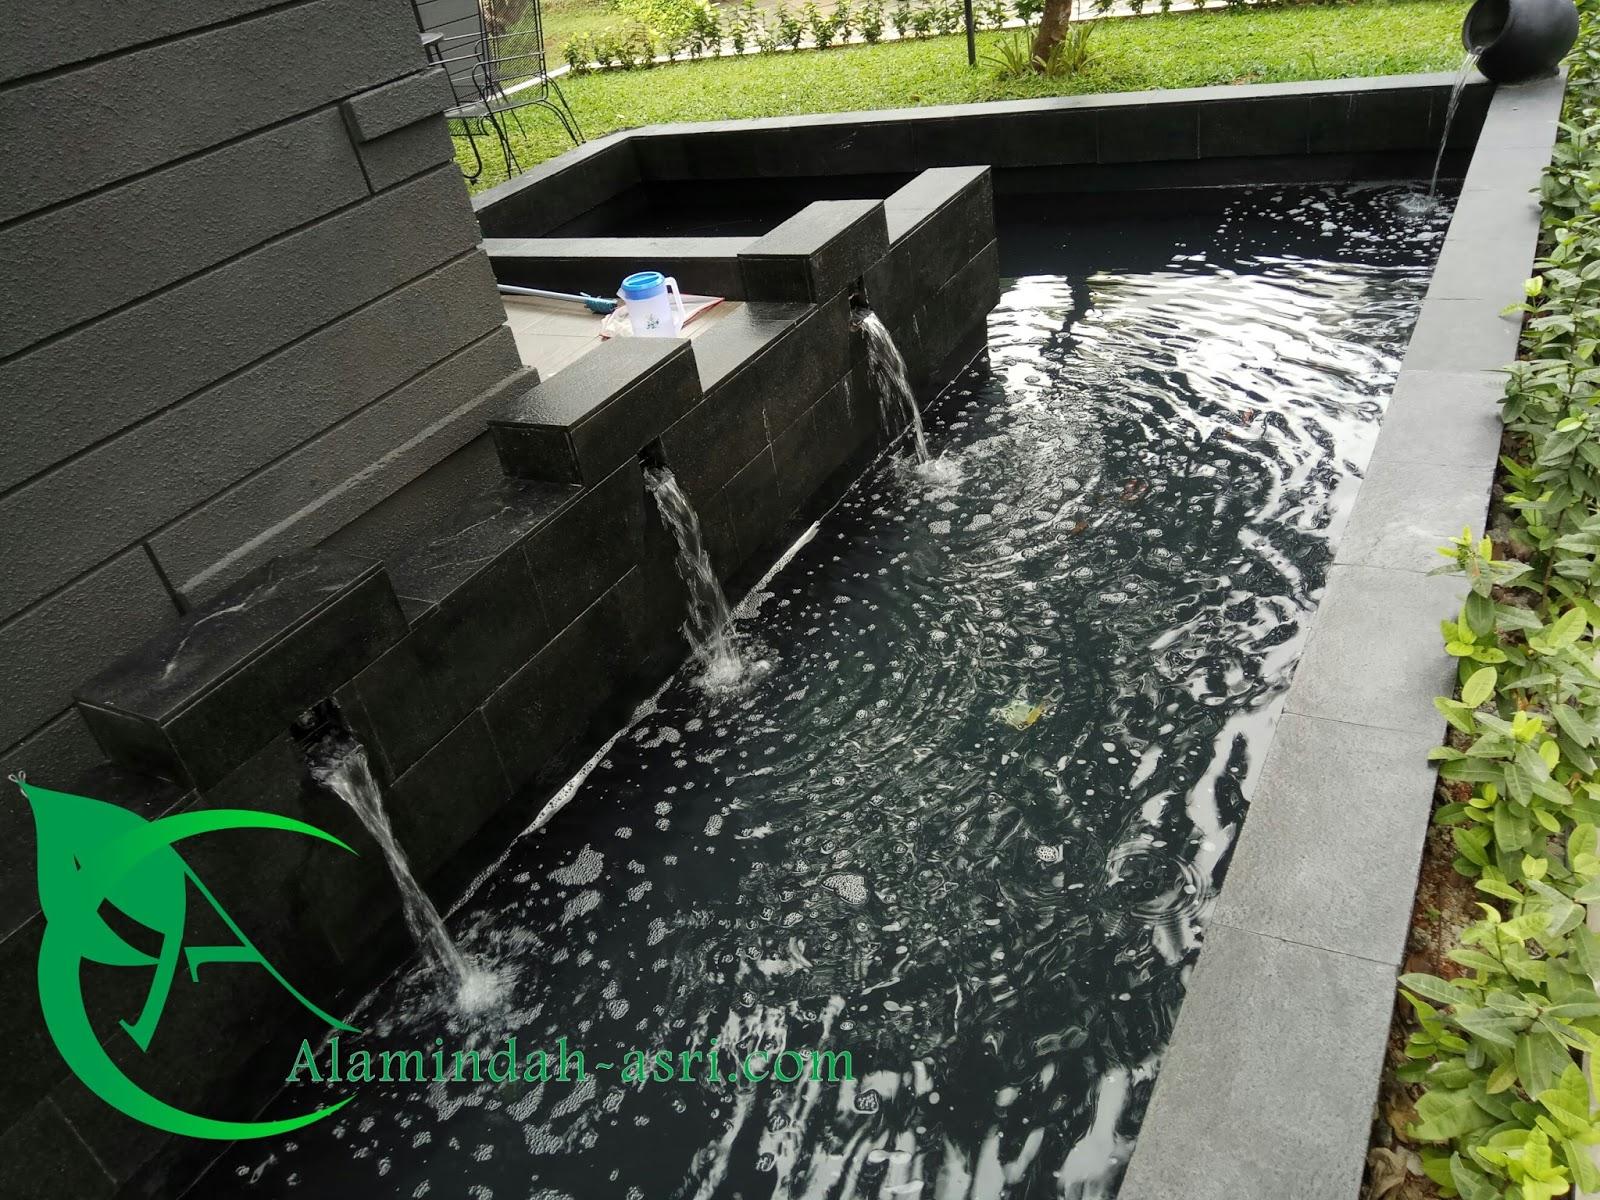 Jasa Pembuatan Kolam Koi Tukang Harga Flexycoat Waterponding 25 Kg Cat Ikan Minimalis